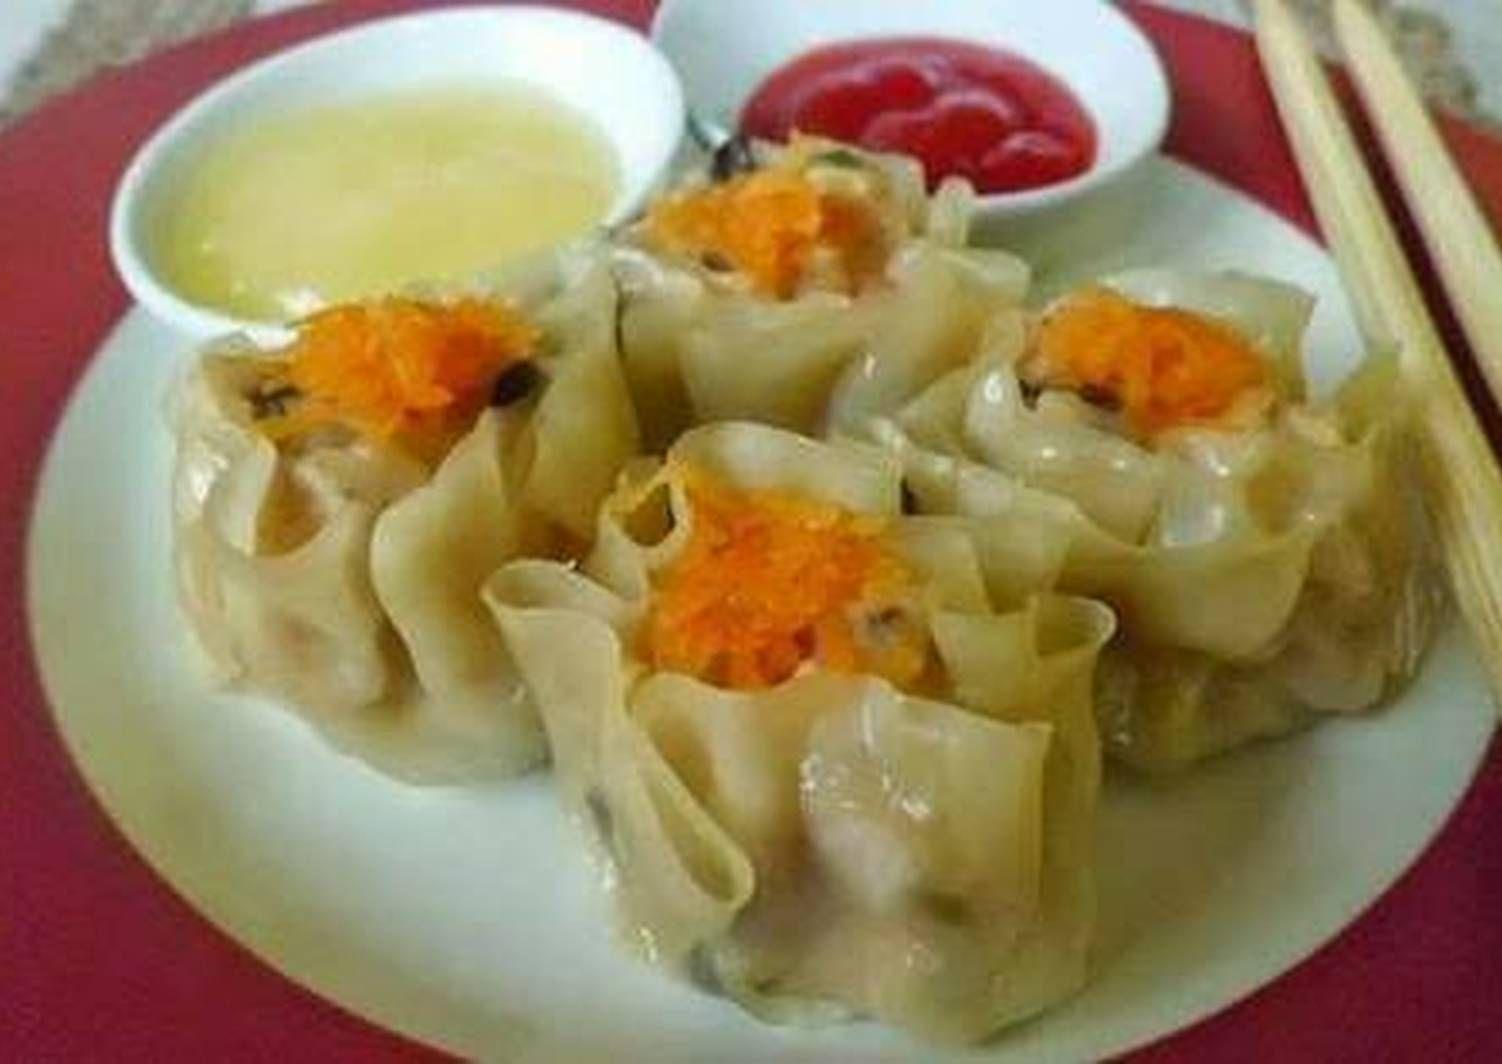 Resep Siomay Ayam Udang Oleh Tintanz Kitchen Agustin Tan Resep Resep Masakan Indonesia Resep Masakan Resep